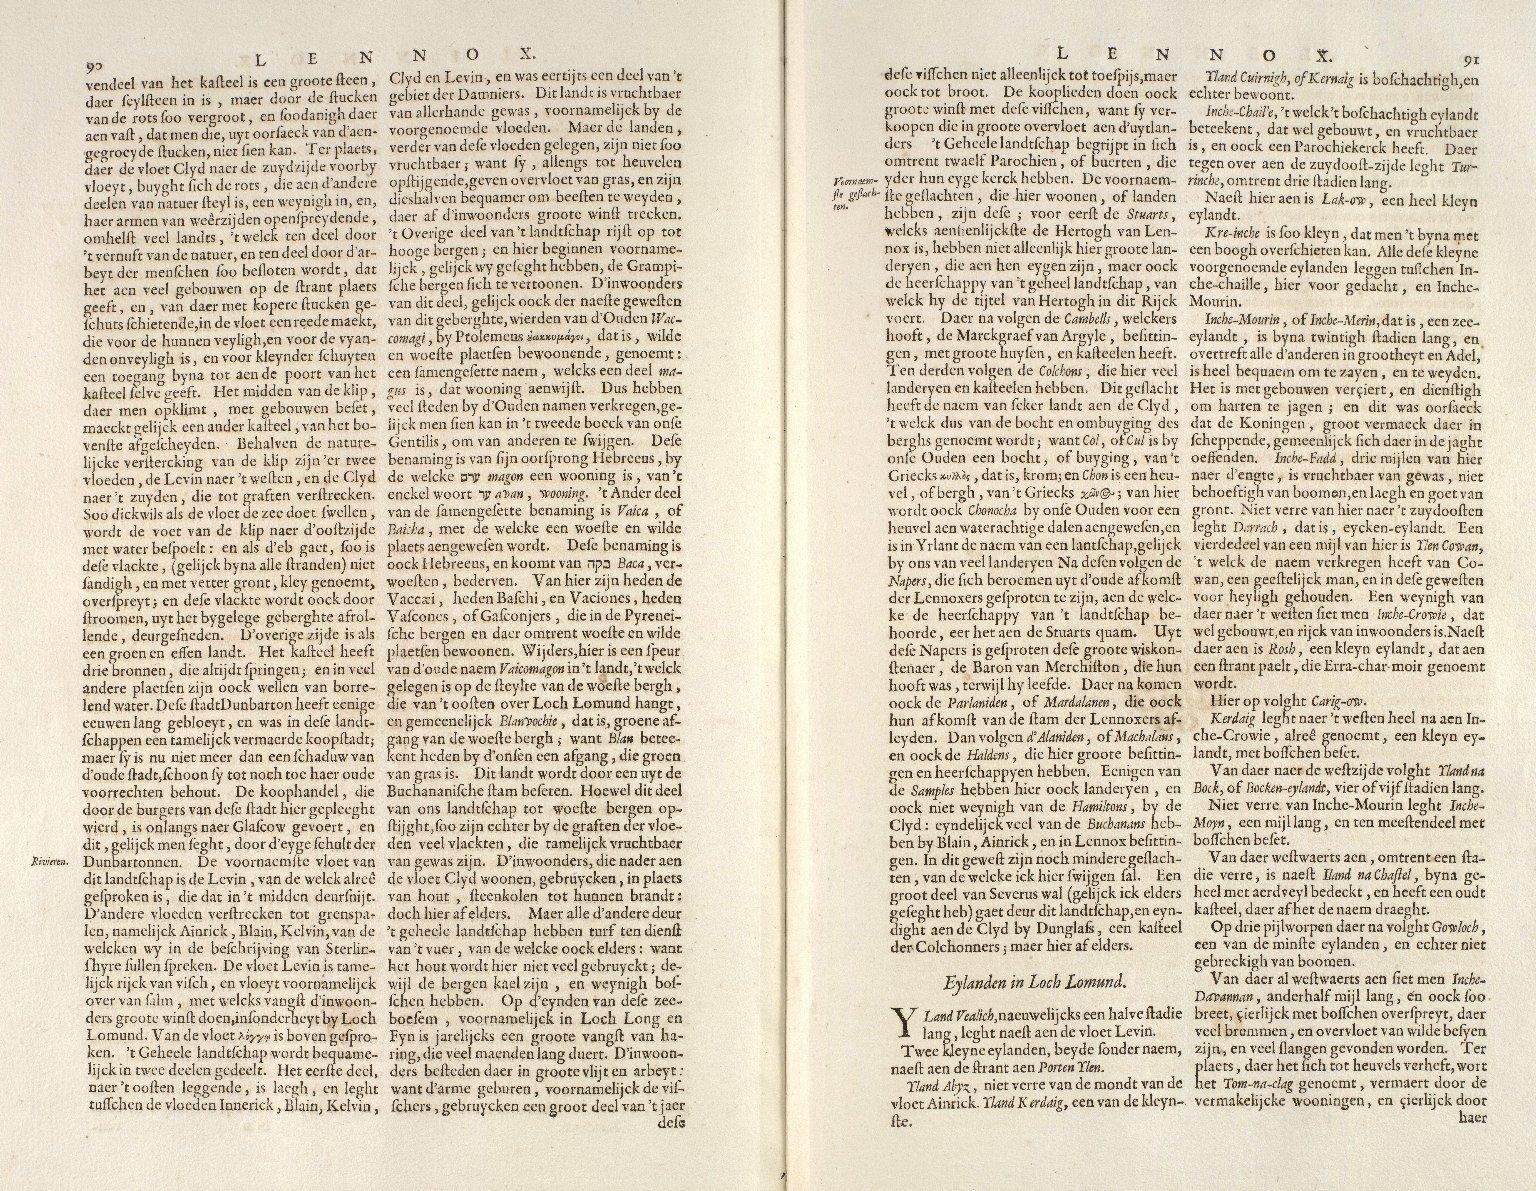 [Geographiae Blavianae] [Also known as: Atlas major] [082 of 153]